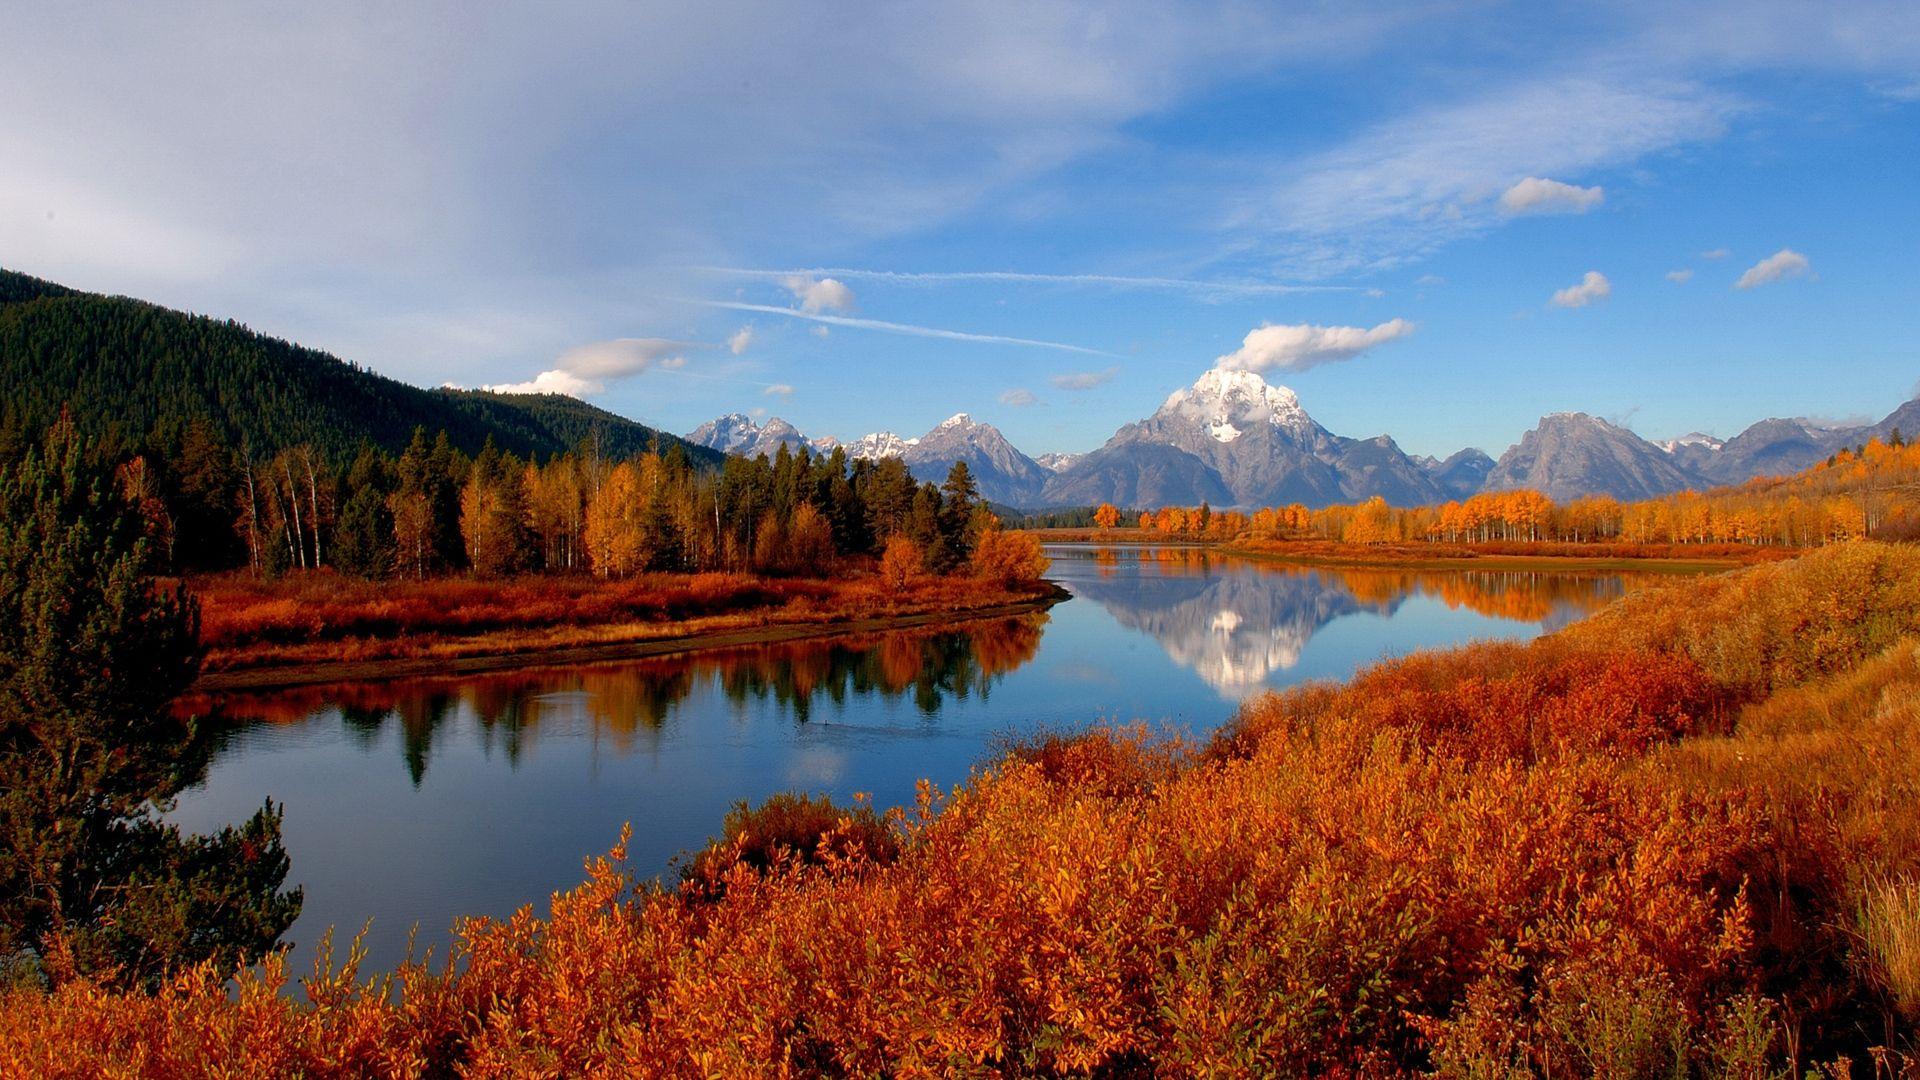 Full HD 1080p Autumn Wallpapers HD Desktop Backgrounds 1920x1080 1920x1080